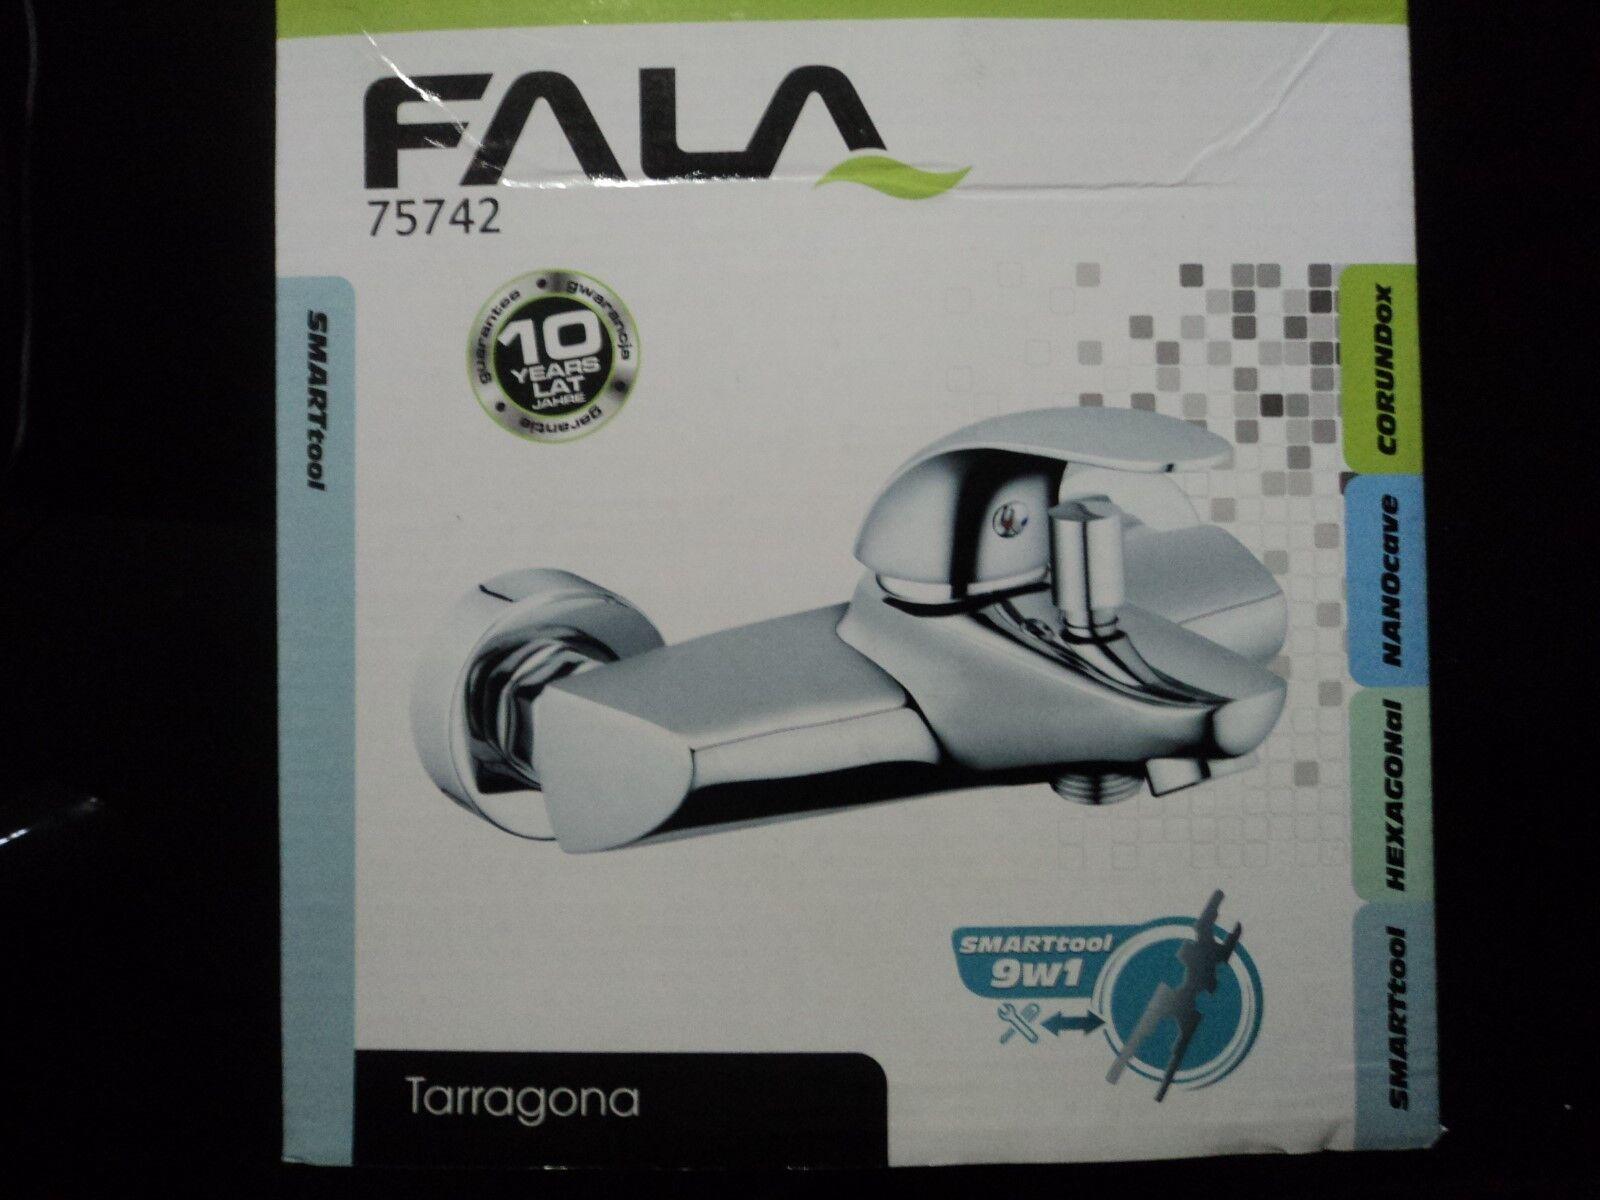 Fala Wandmontierbarer Badewannen-Wasserhahn Tarragona Messing 75742